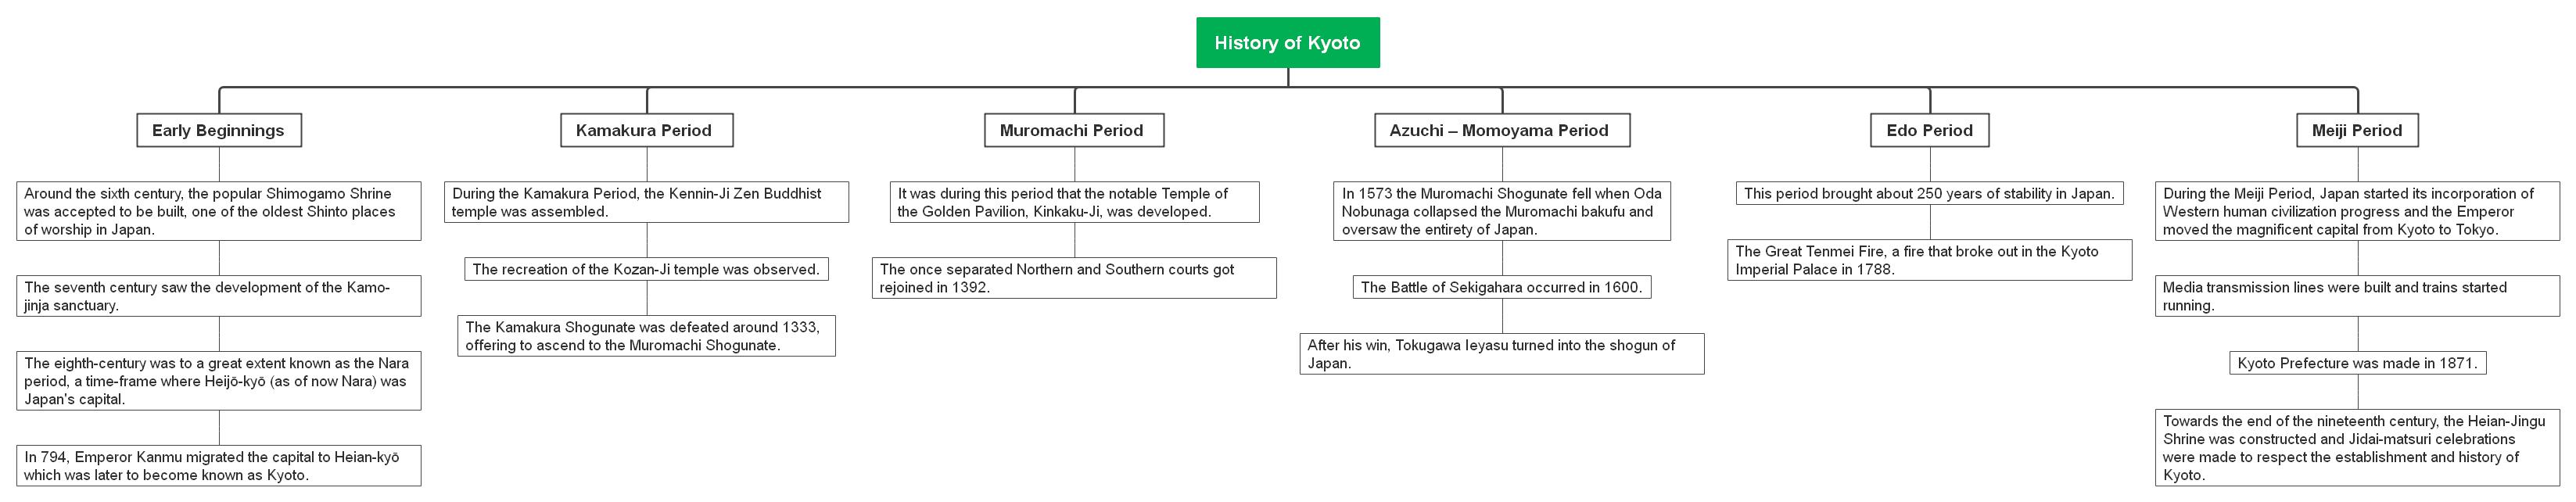 history-of-kyoto